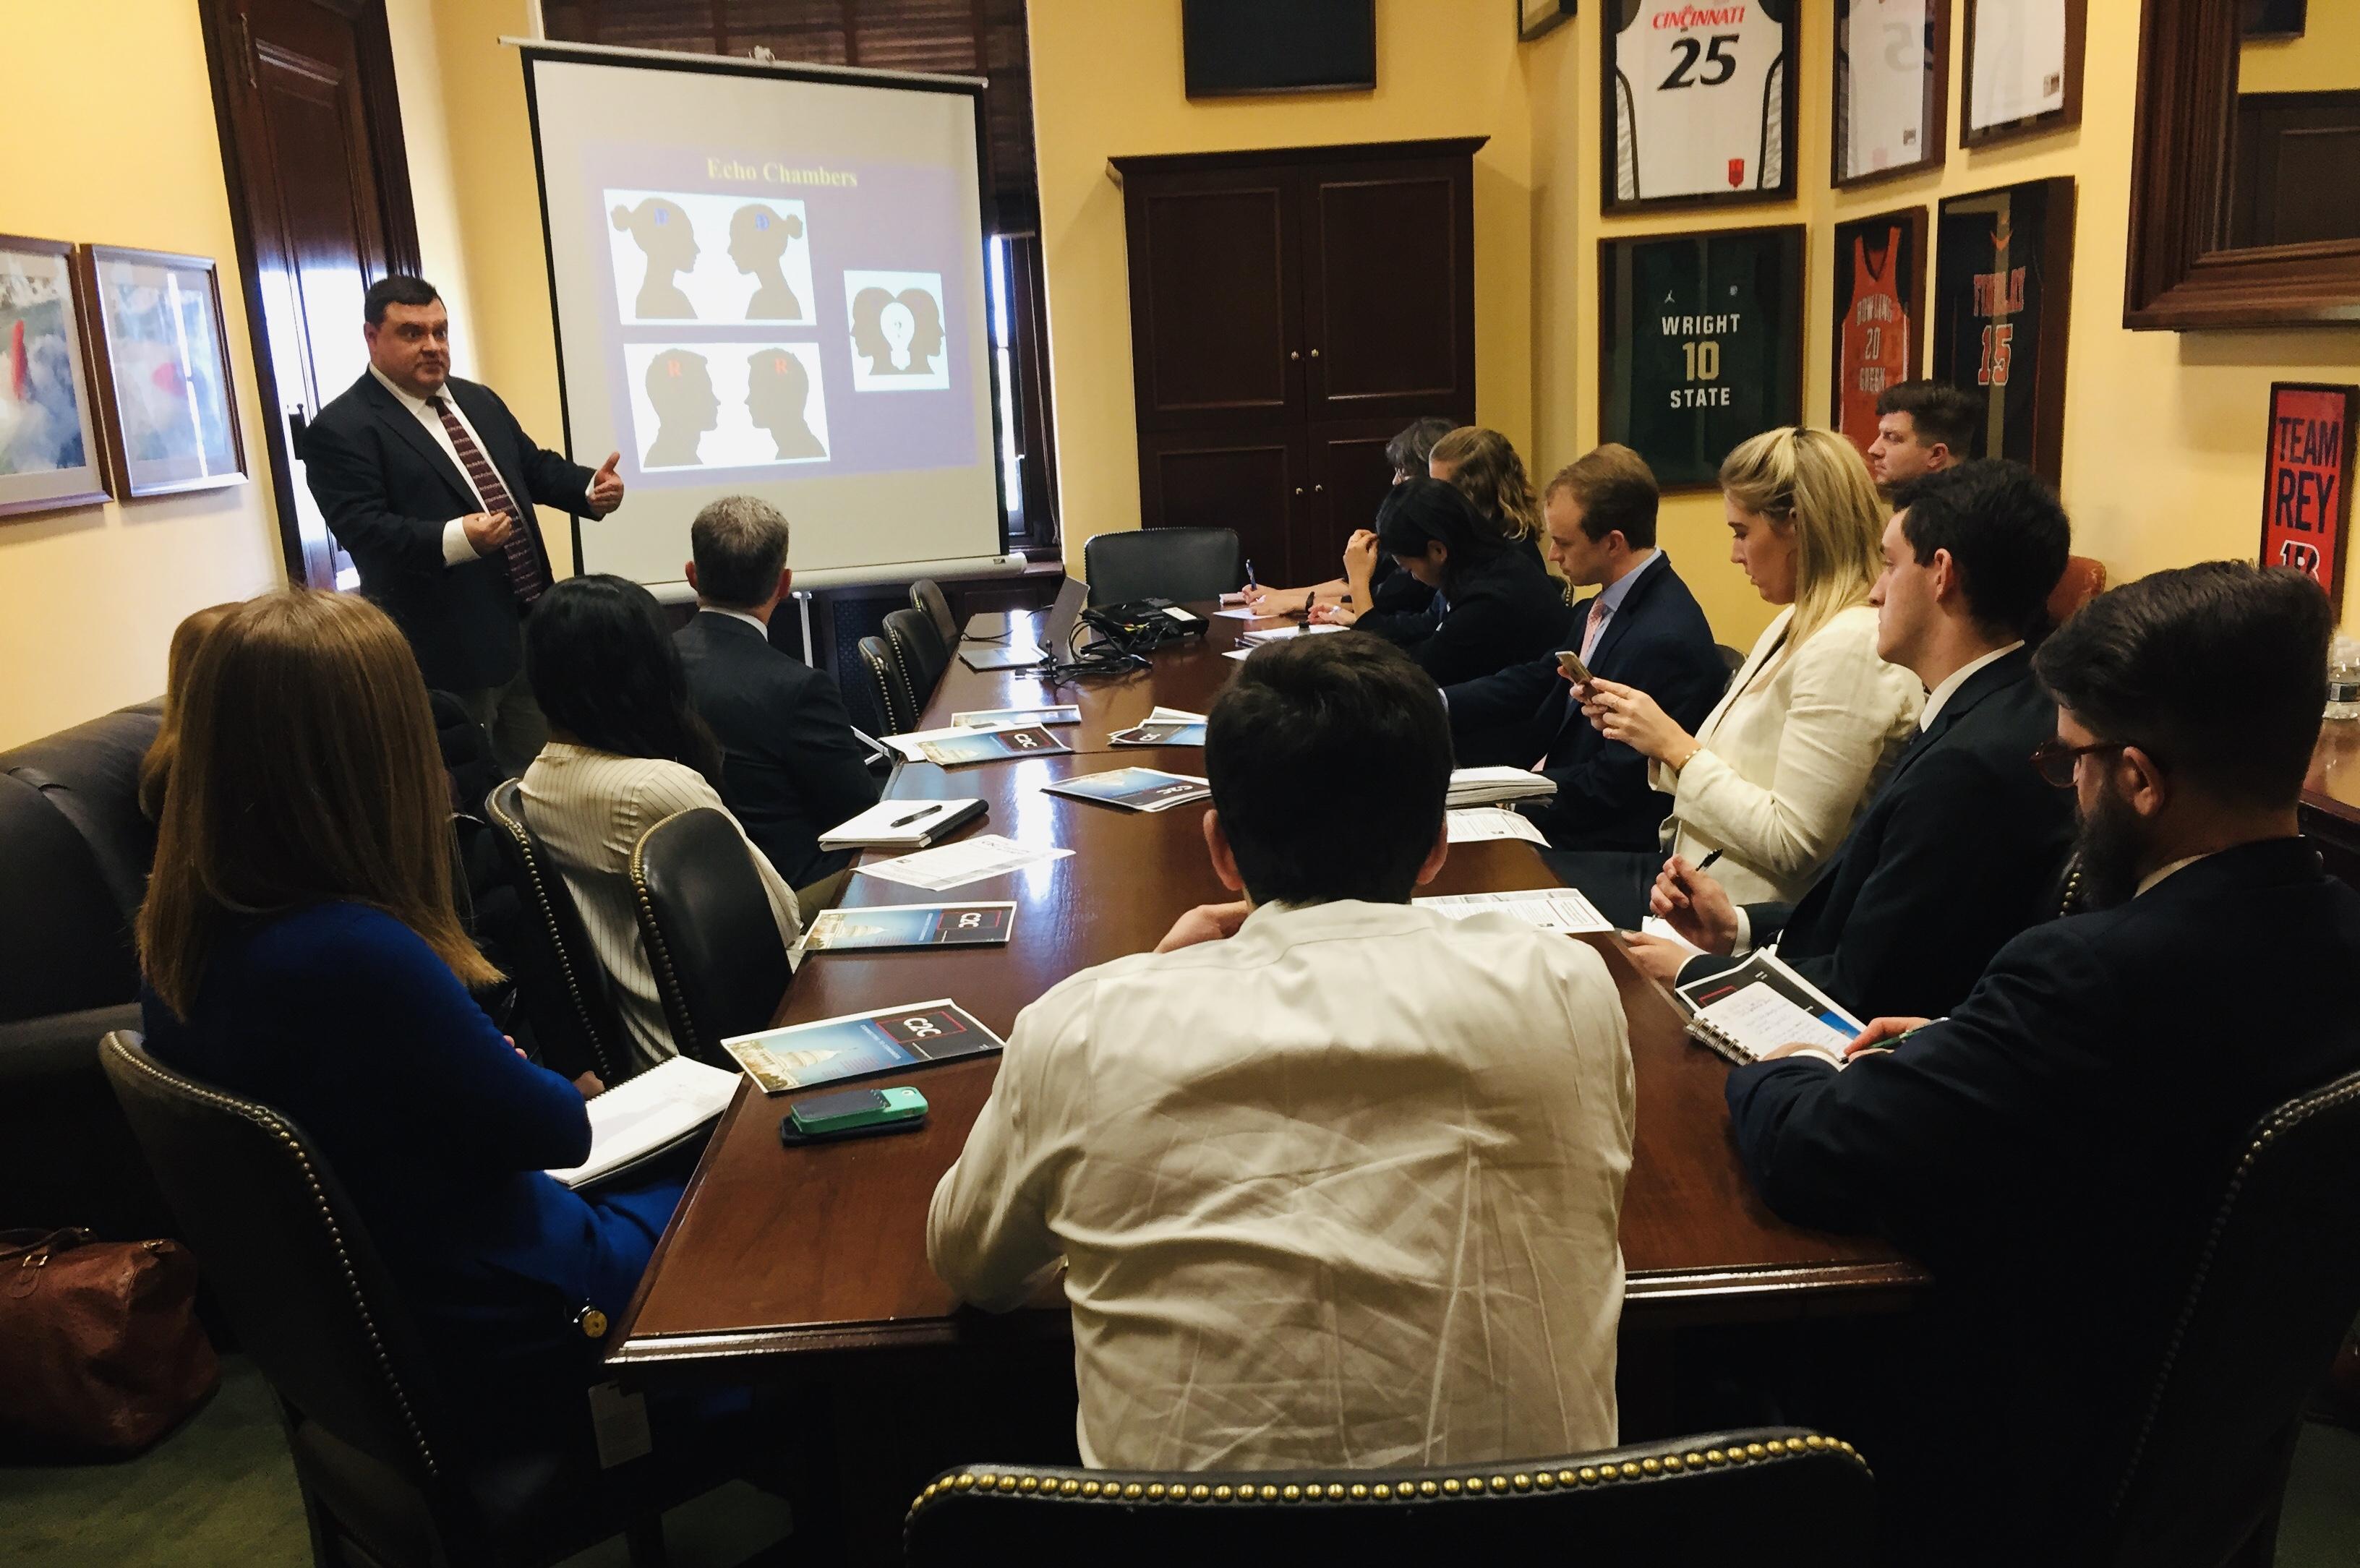 Michael Neblo (standing) presenting in Washington, D.C.